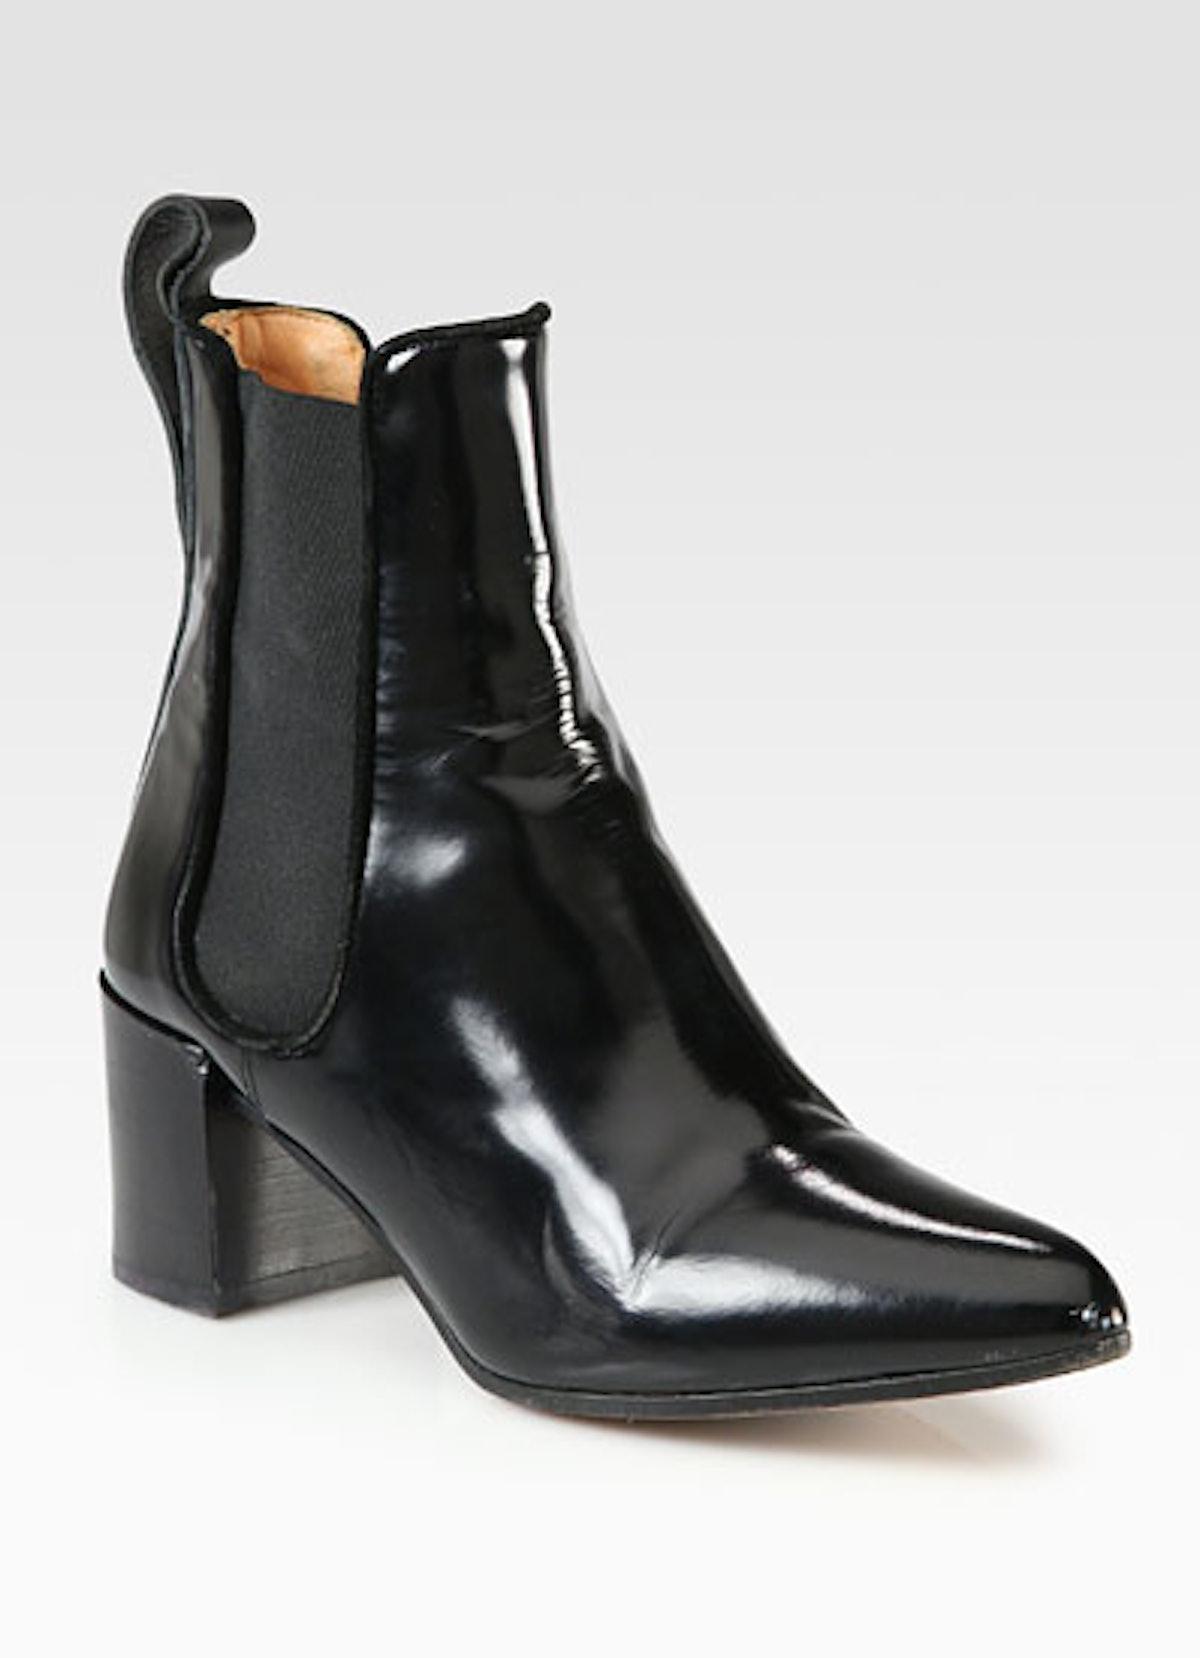 fass-flat-boot-trend-06-v.jpg